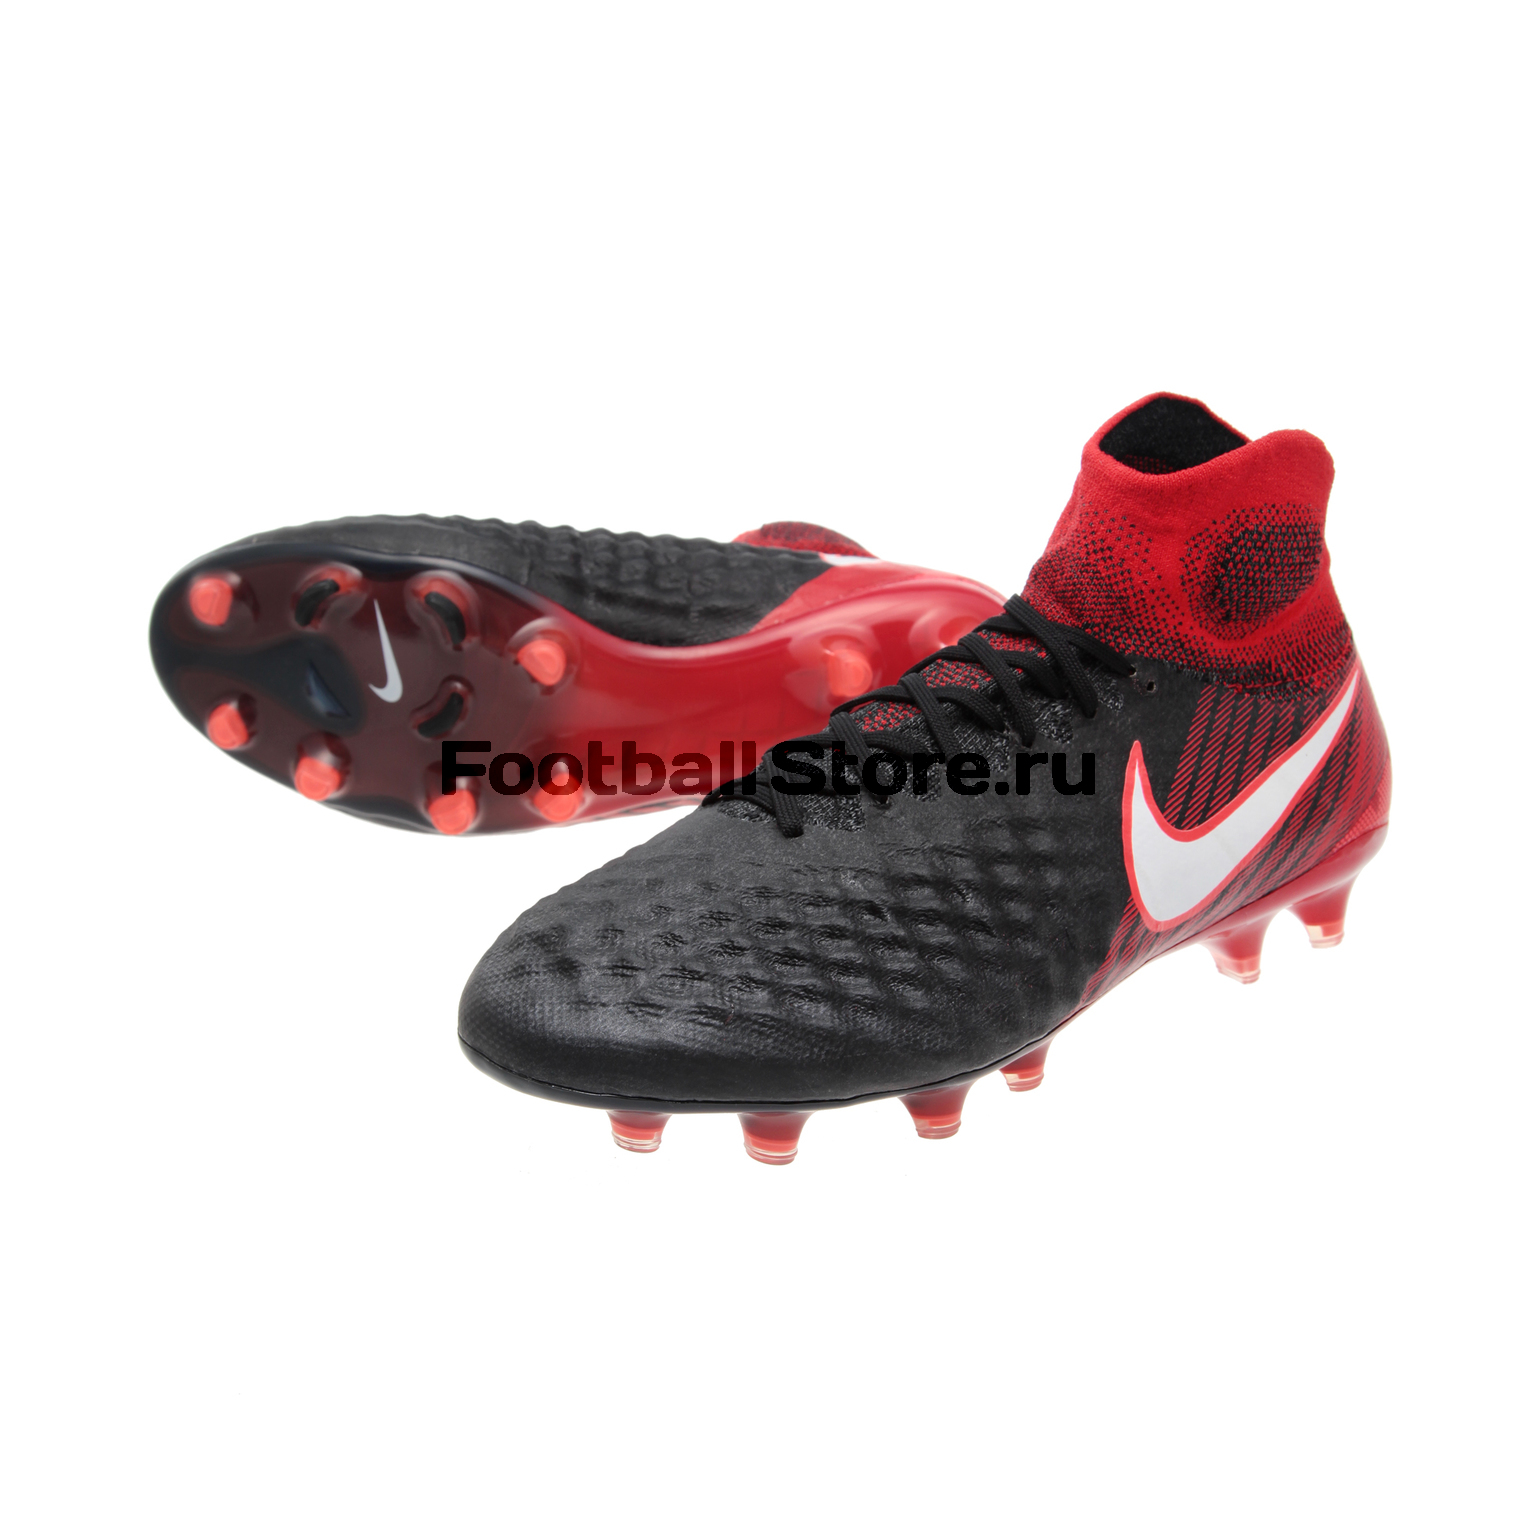 Бутсы Nike Magista Obra II FG 844595-061 nike бутсы nike magista obra ii fg 844595 008